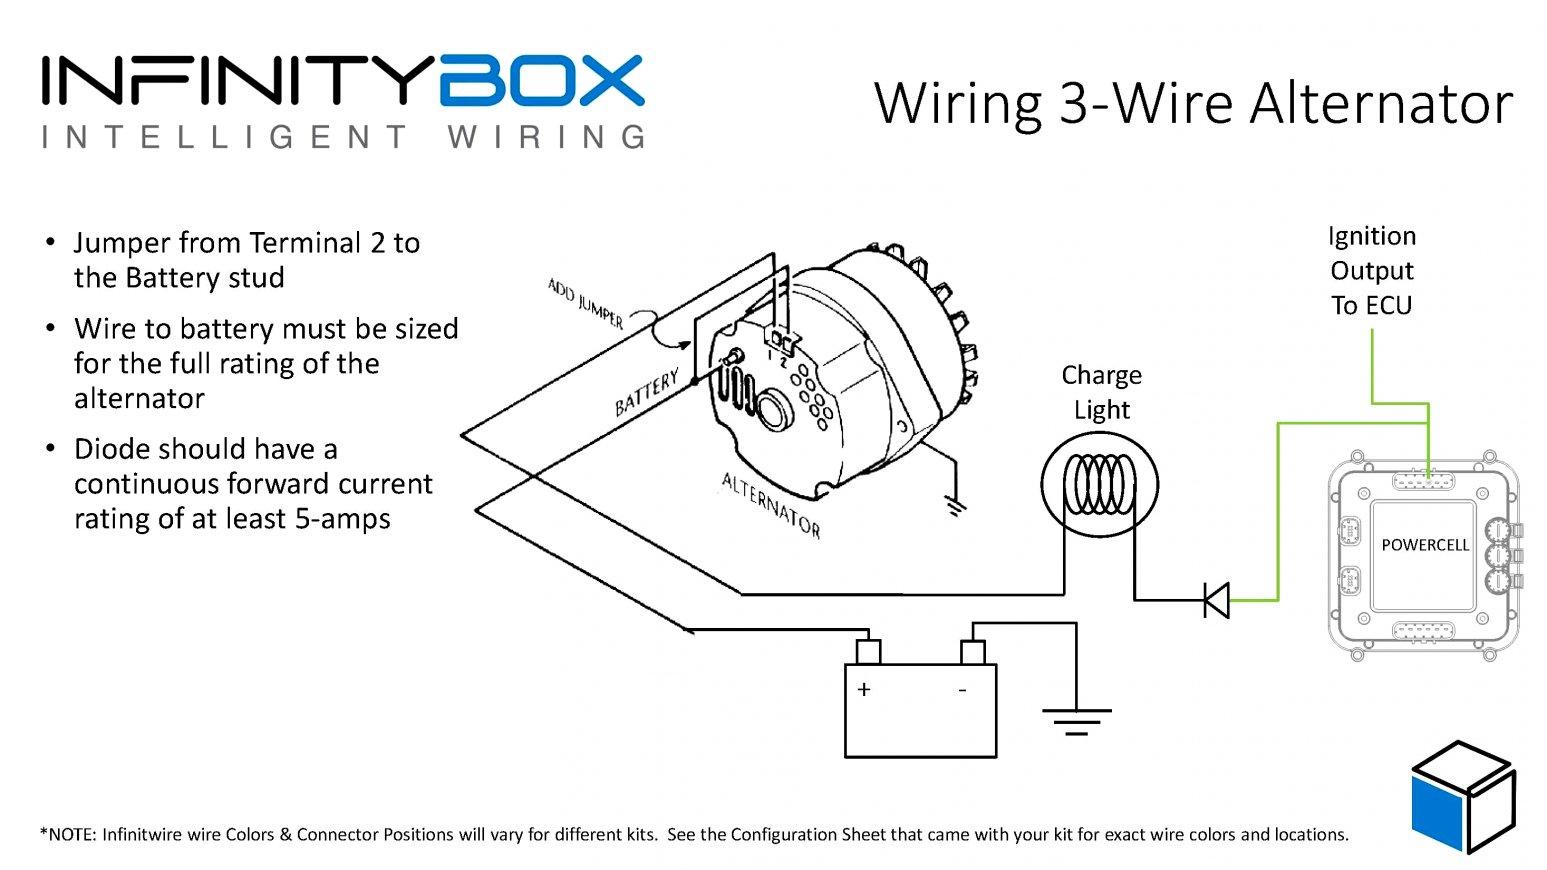 10Si Alternator Wiring - Wiring Diagrams Click - Delco 10Si Alternator Wiring Diagram